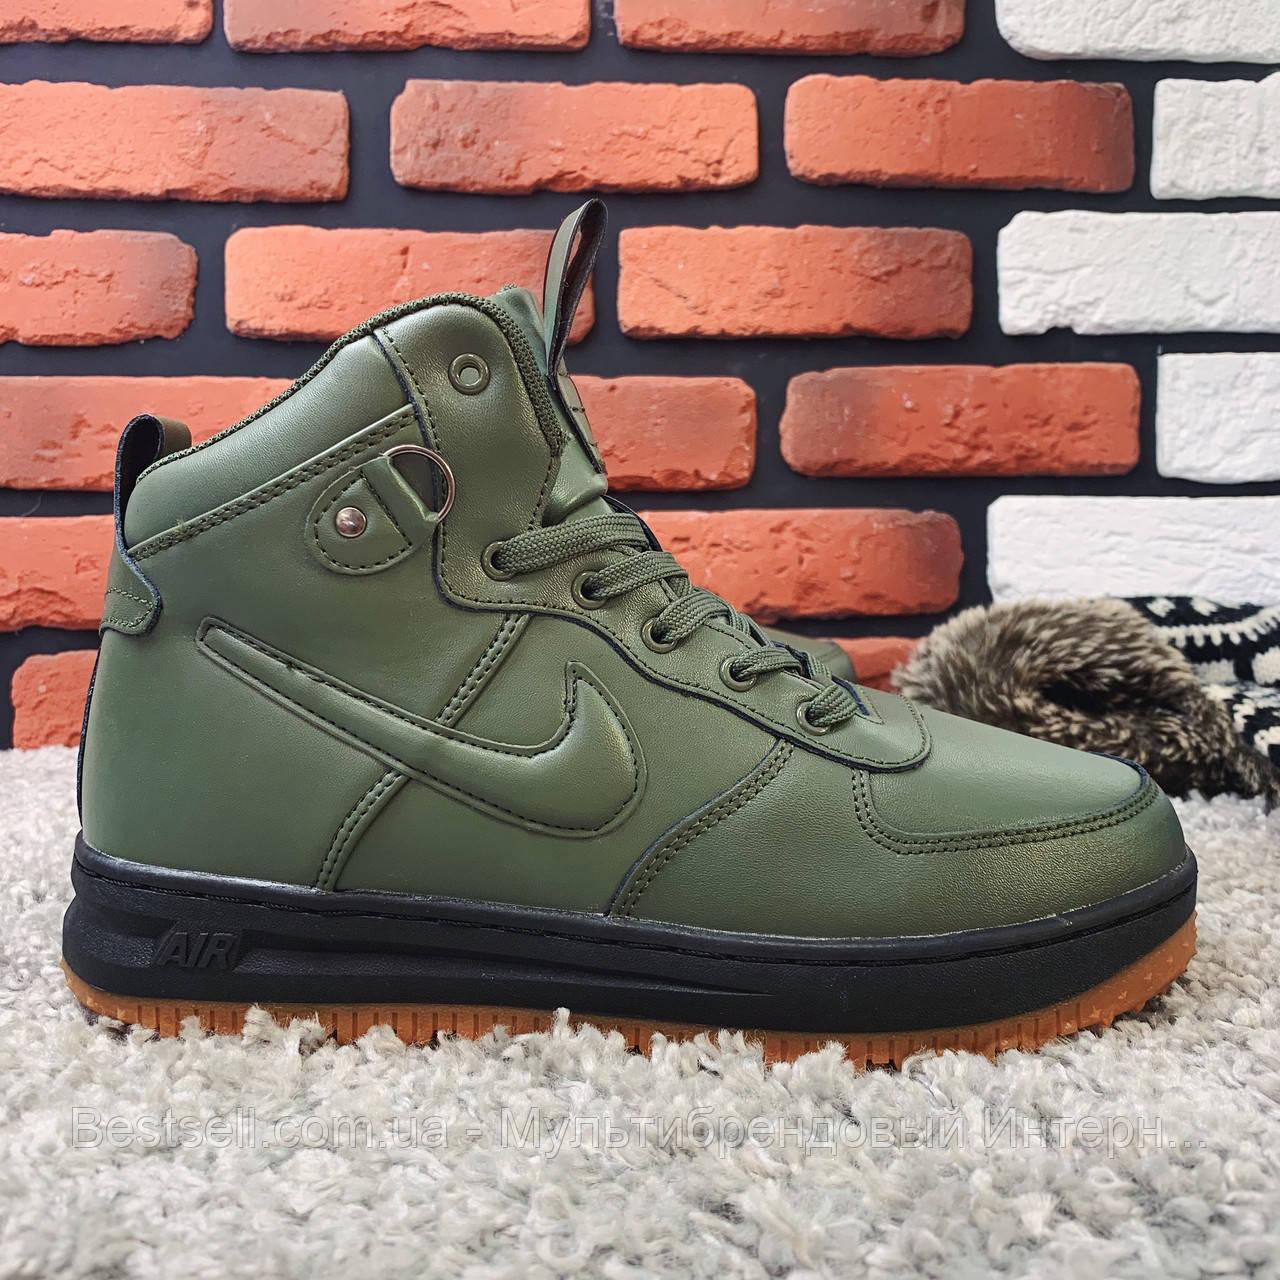 Зимние кроссовки (на меху) Nike LF 1 1-169 ⏩ [46 последний размер ]